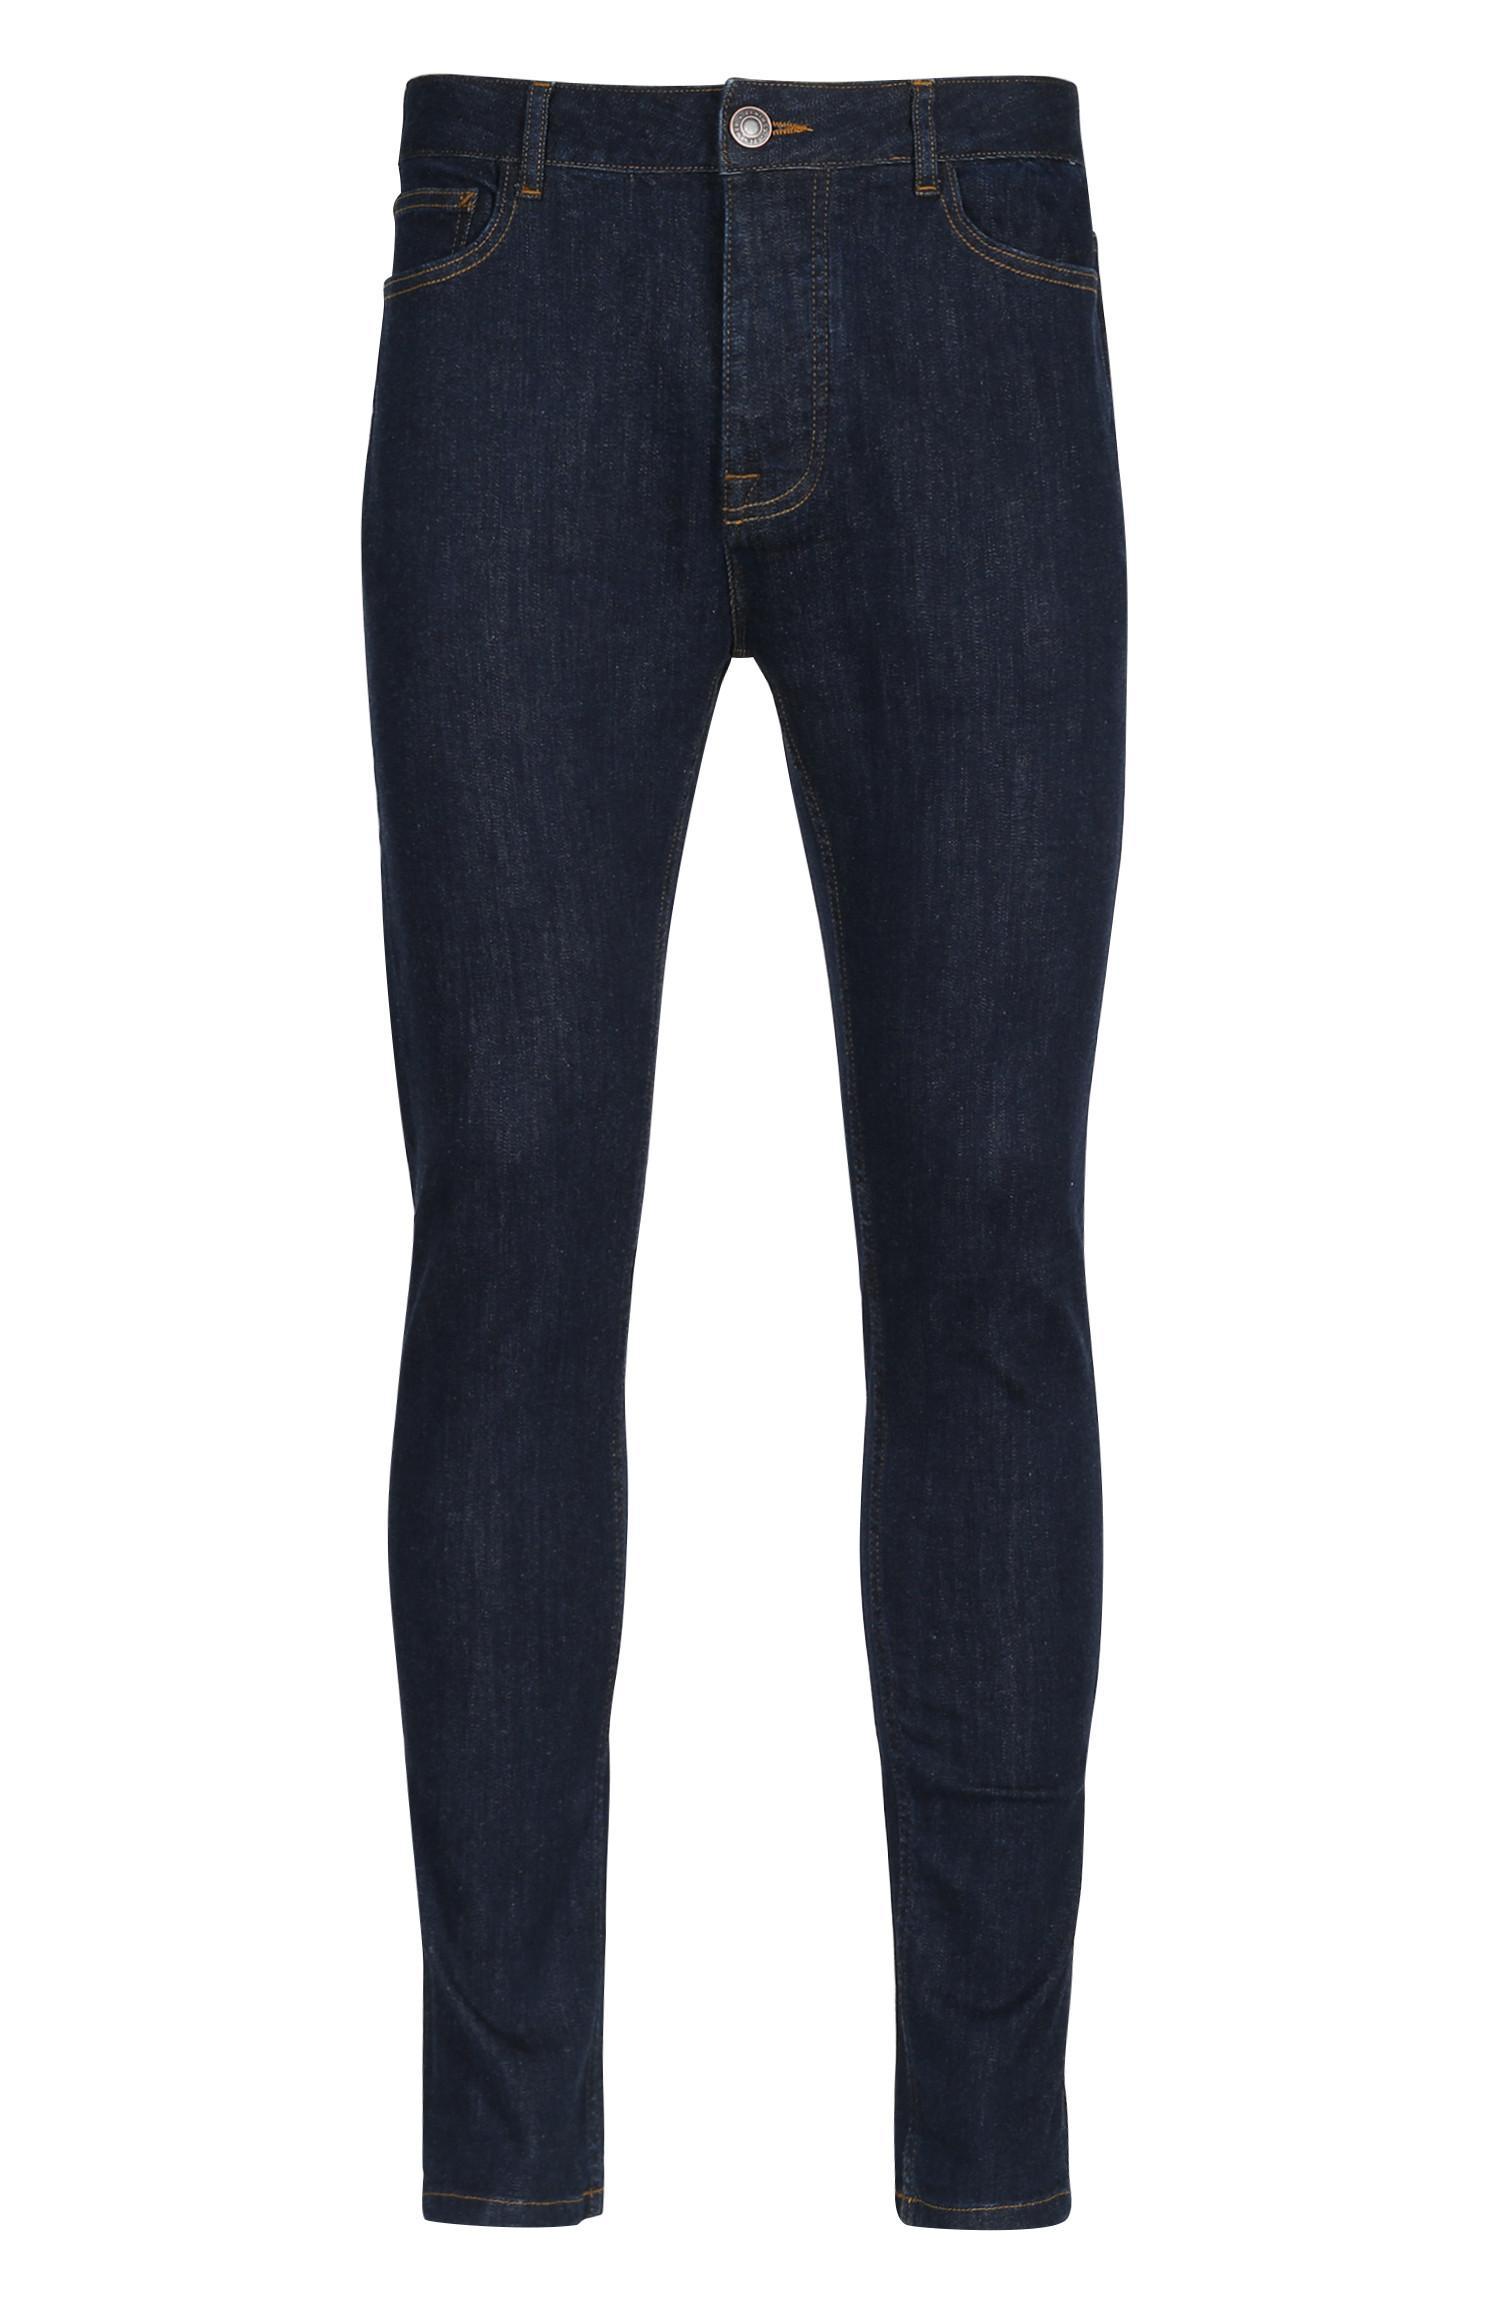 Blaue Skinny Jeans mit Stretch